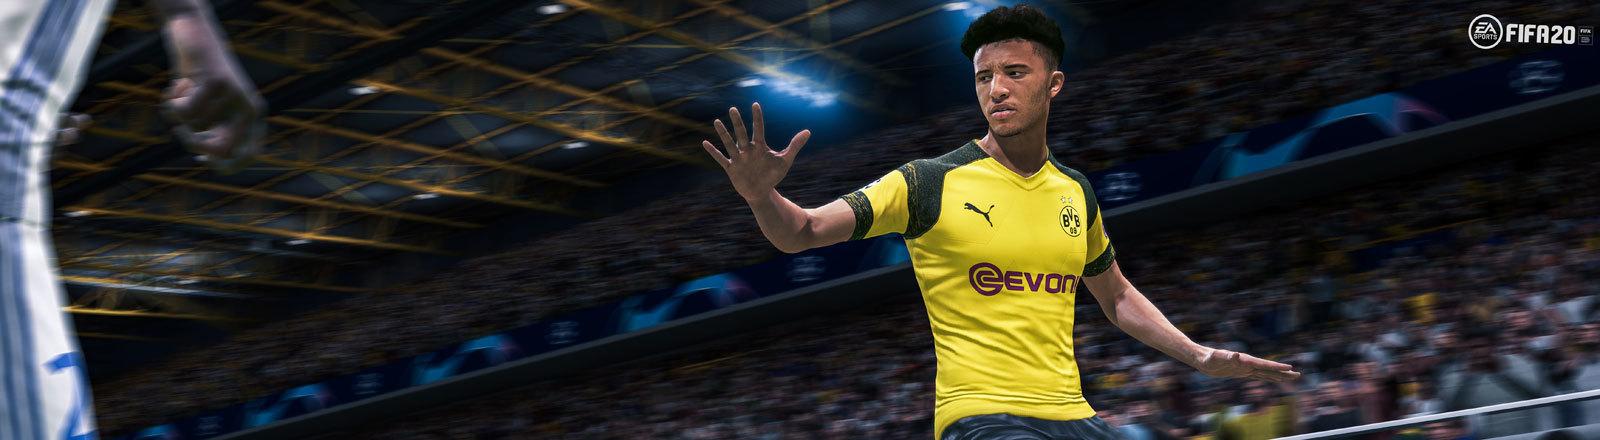 Screenshot aus dem Game Fifa 20 des Unternehmens EA.